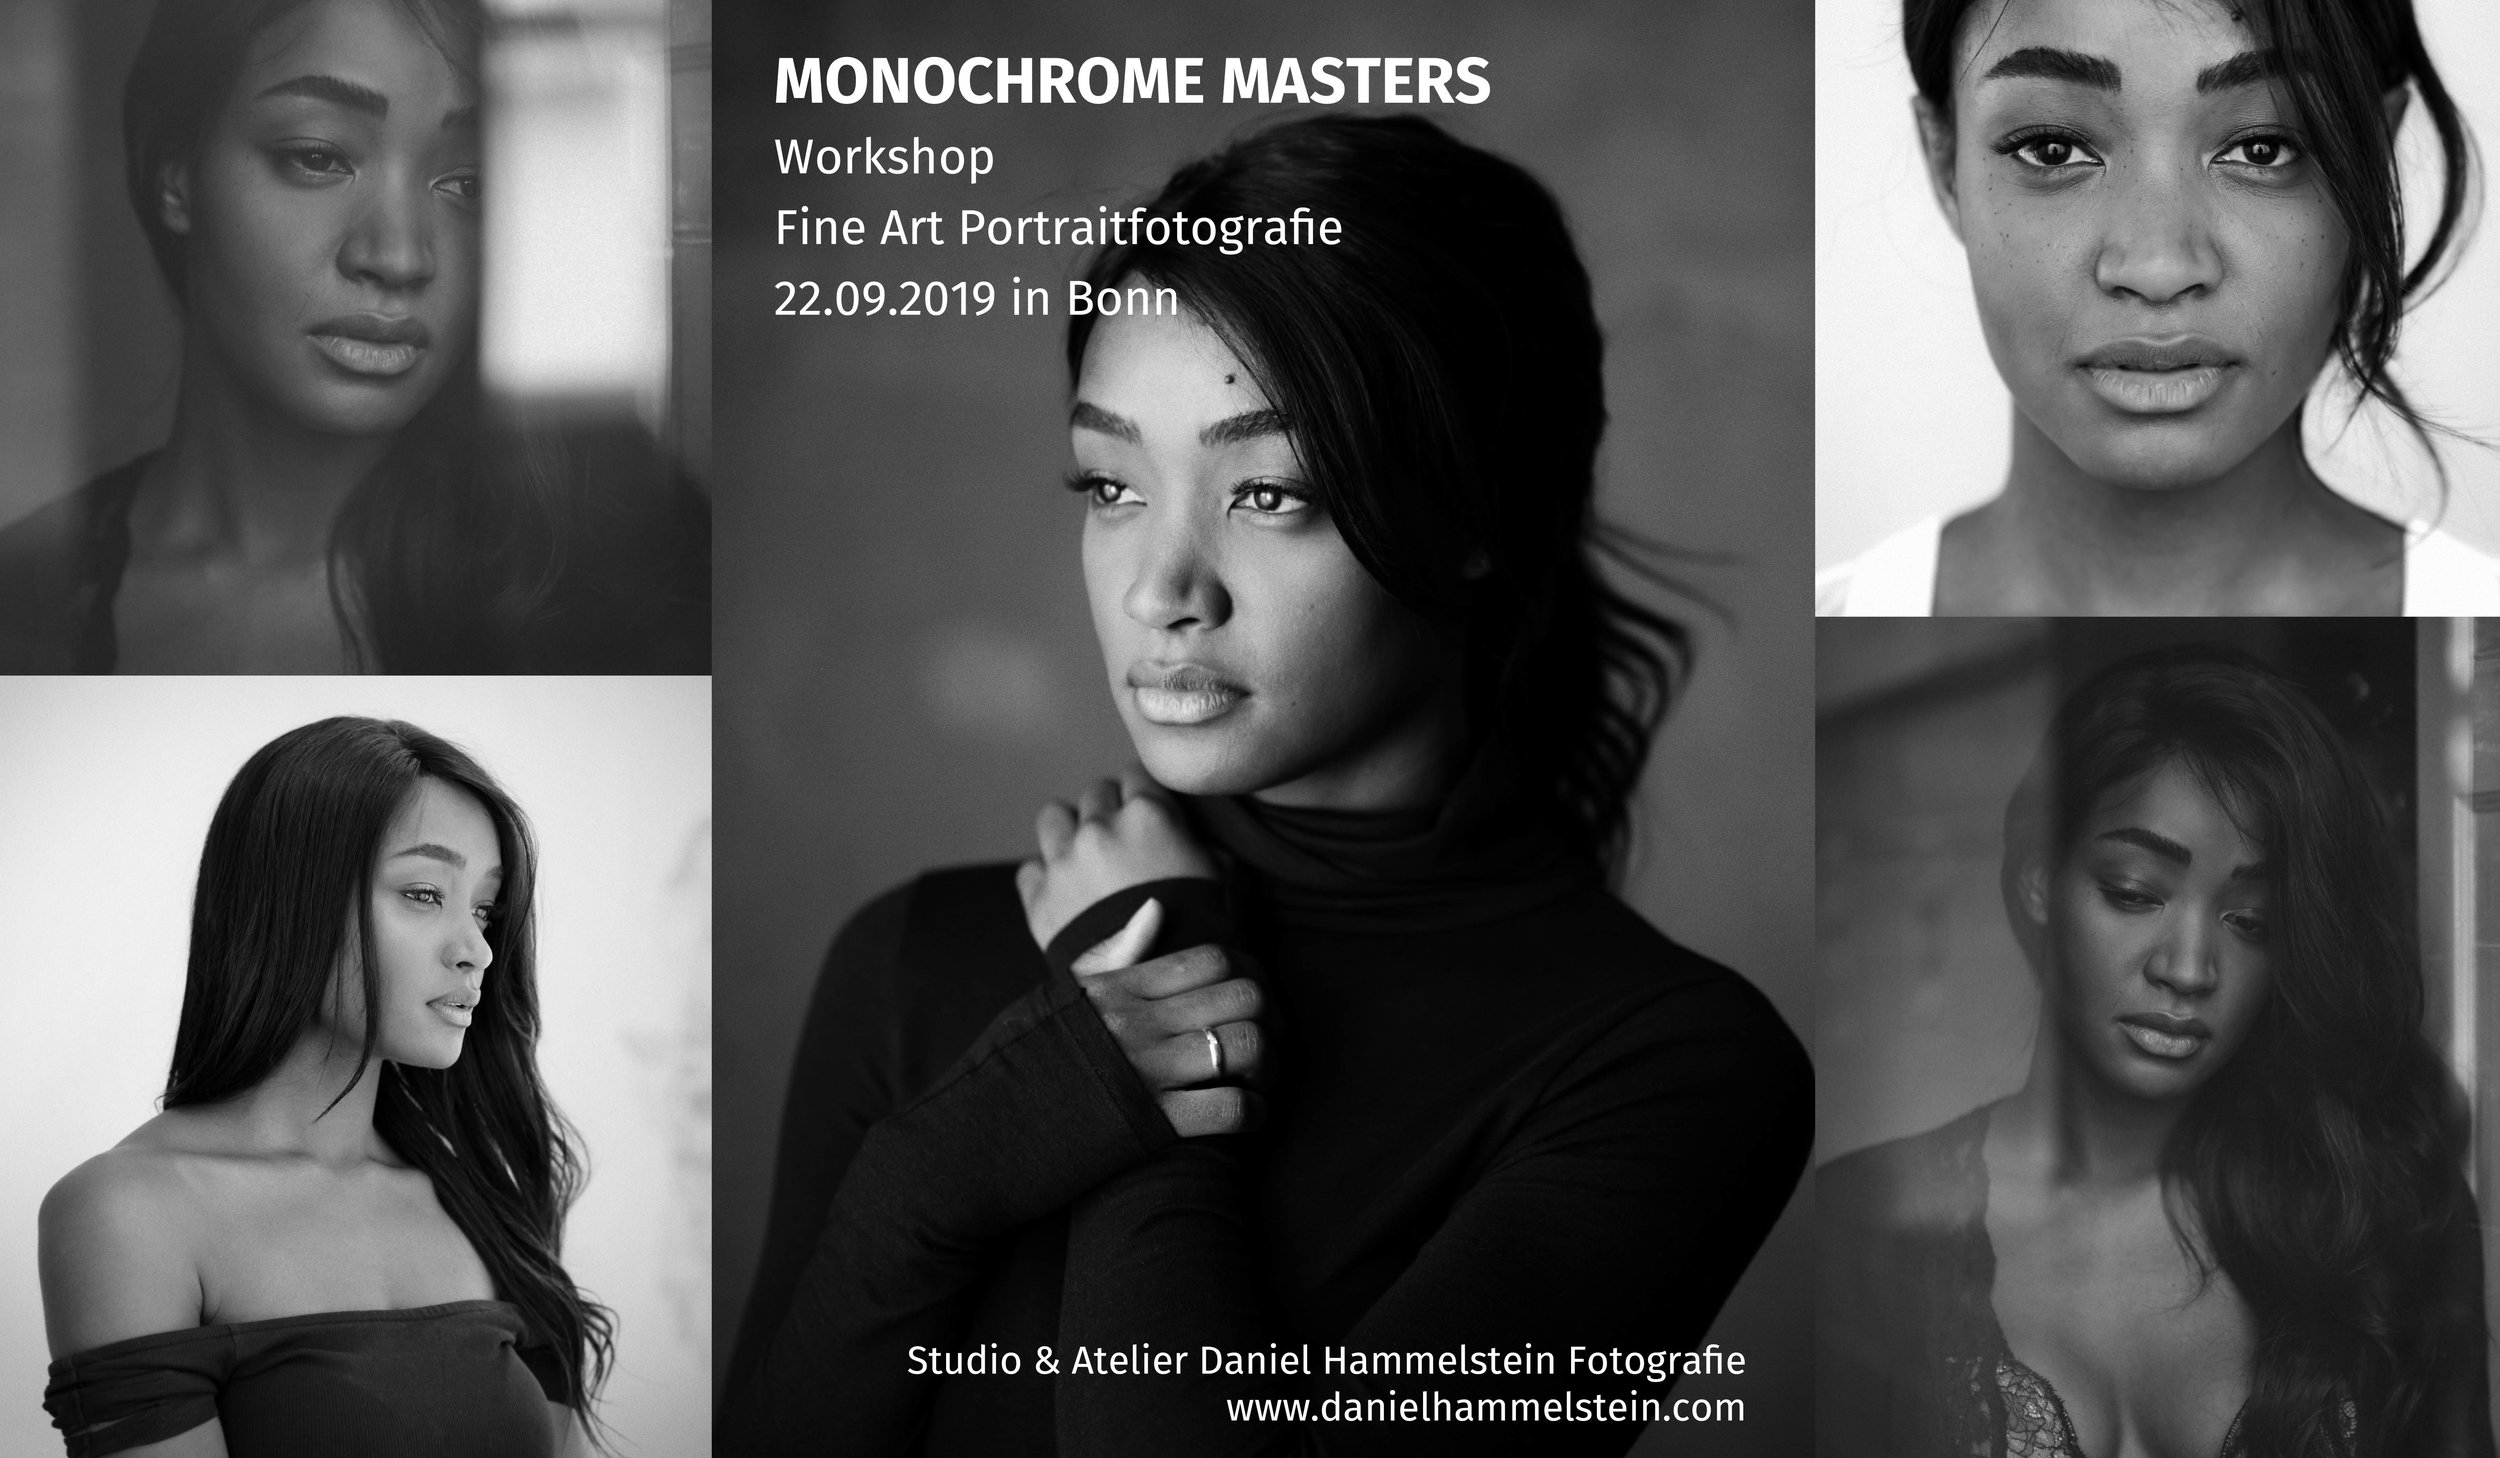 Workshop Fotokurs Bonn Köln Portraitfotografie Schwarzweissfotografie Fotoworkshop Düsseldorf NRW September 2019.jpg